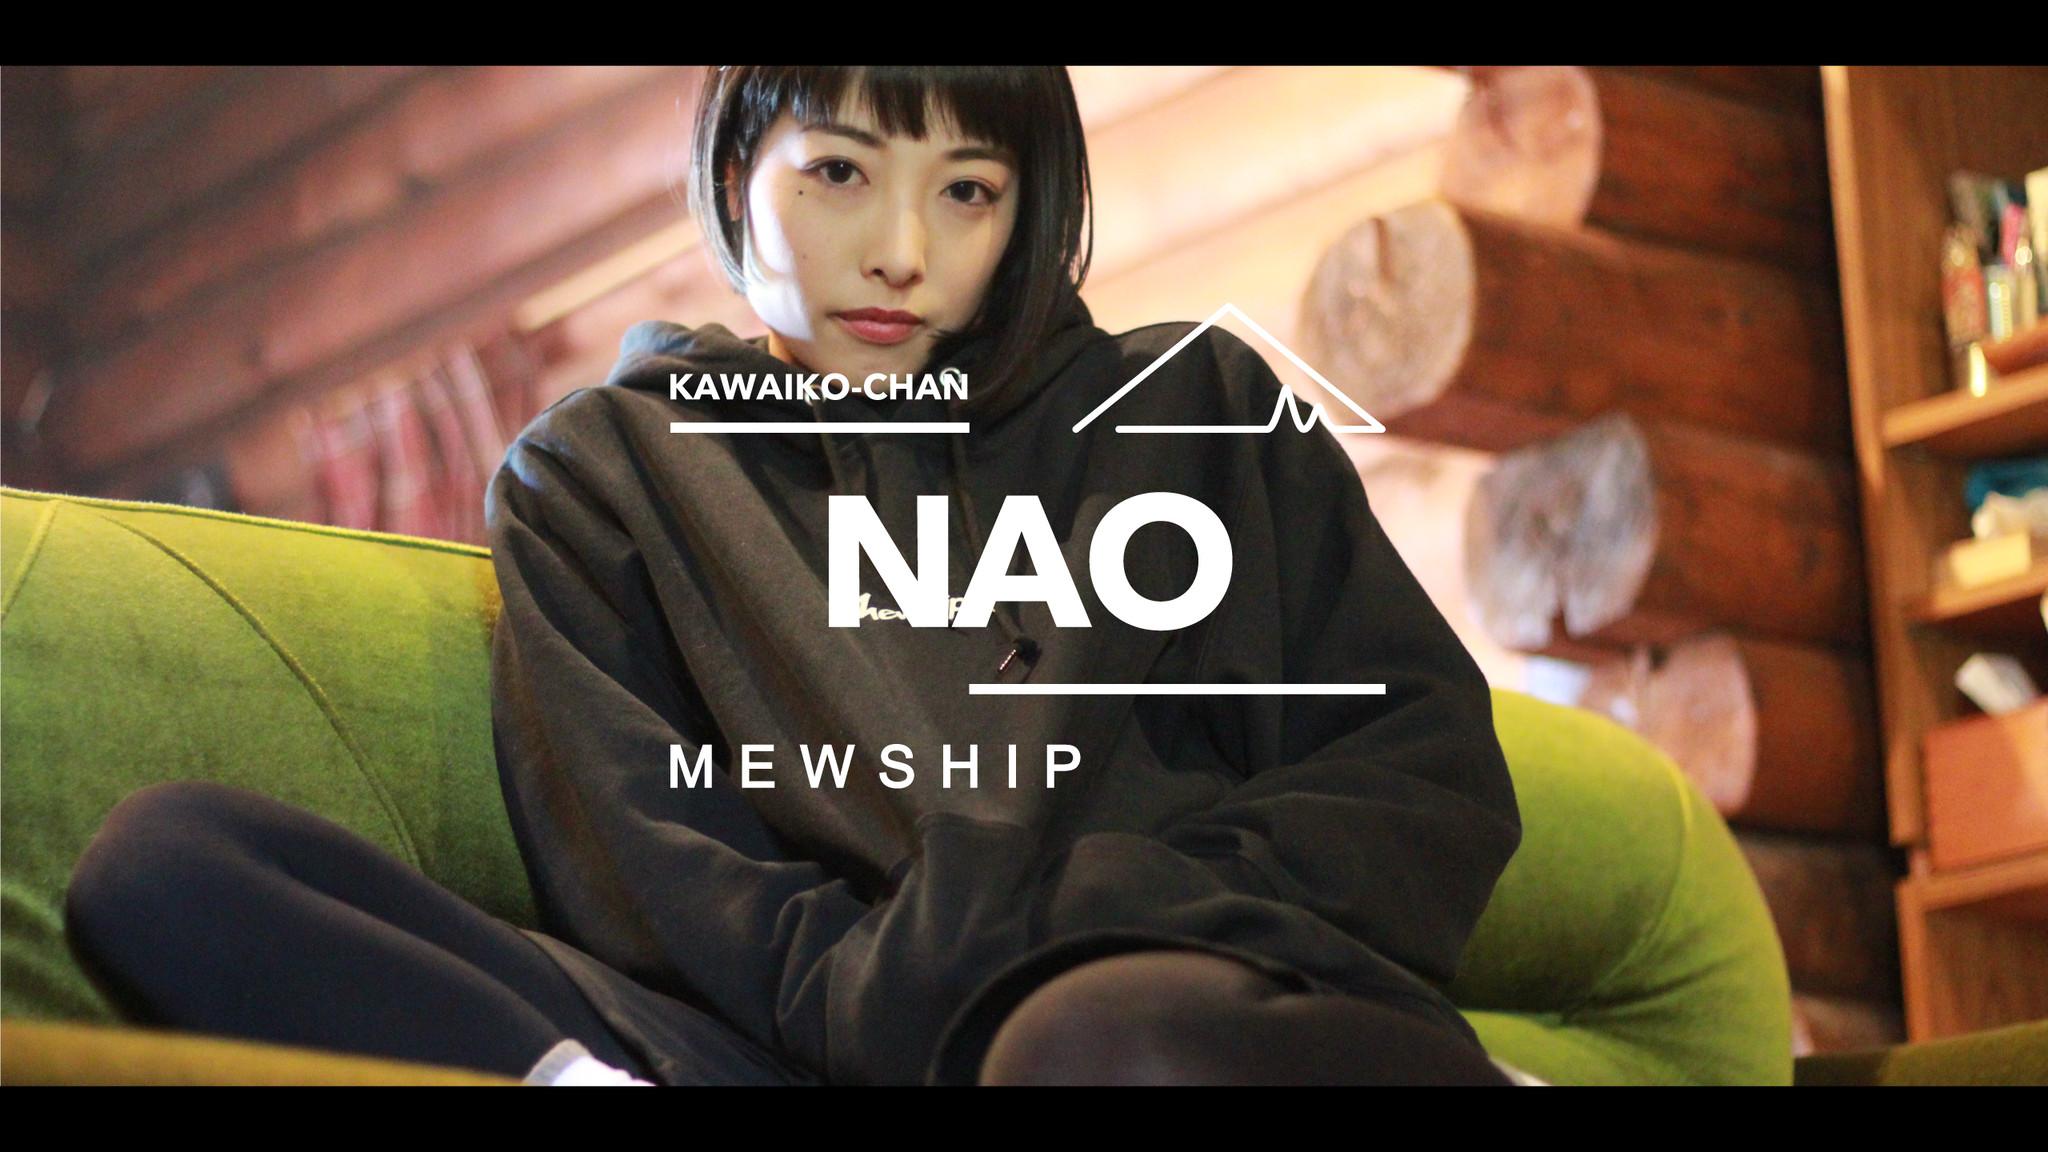 "MEWSHIP ""KAWAIKO-CHAN"" NAO 2019.03.13 富山美女"